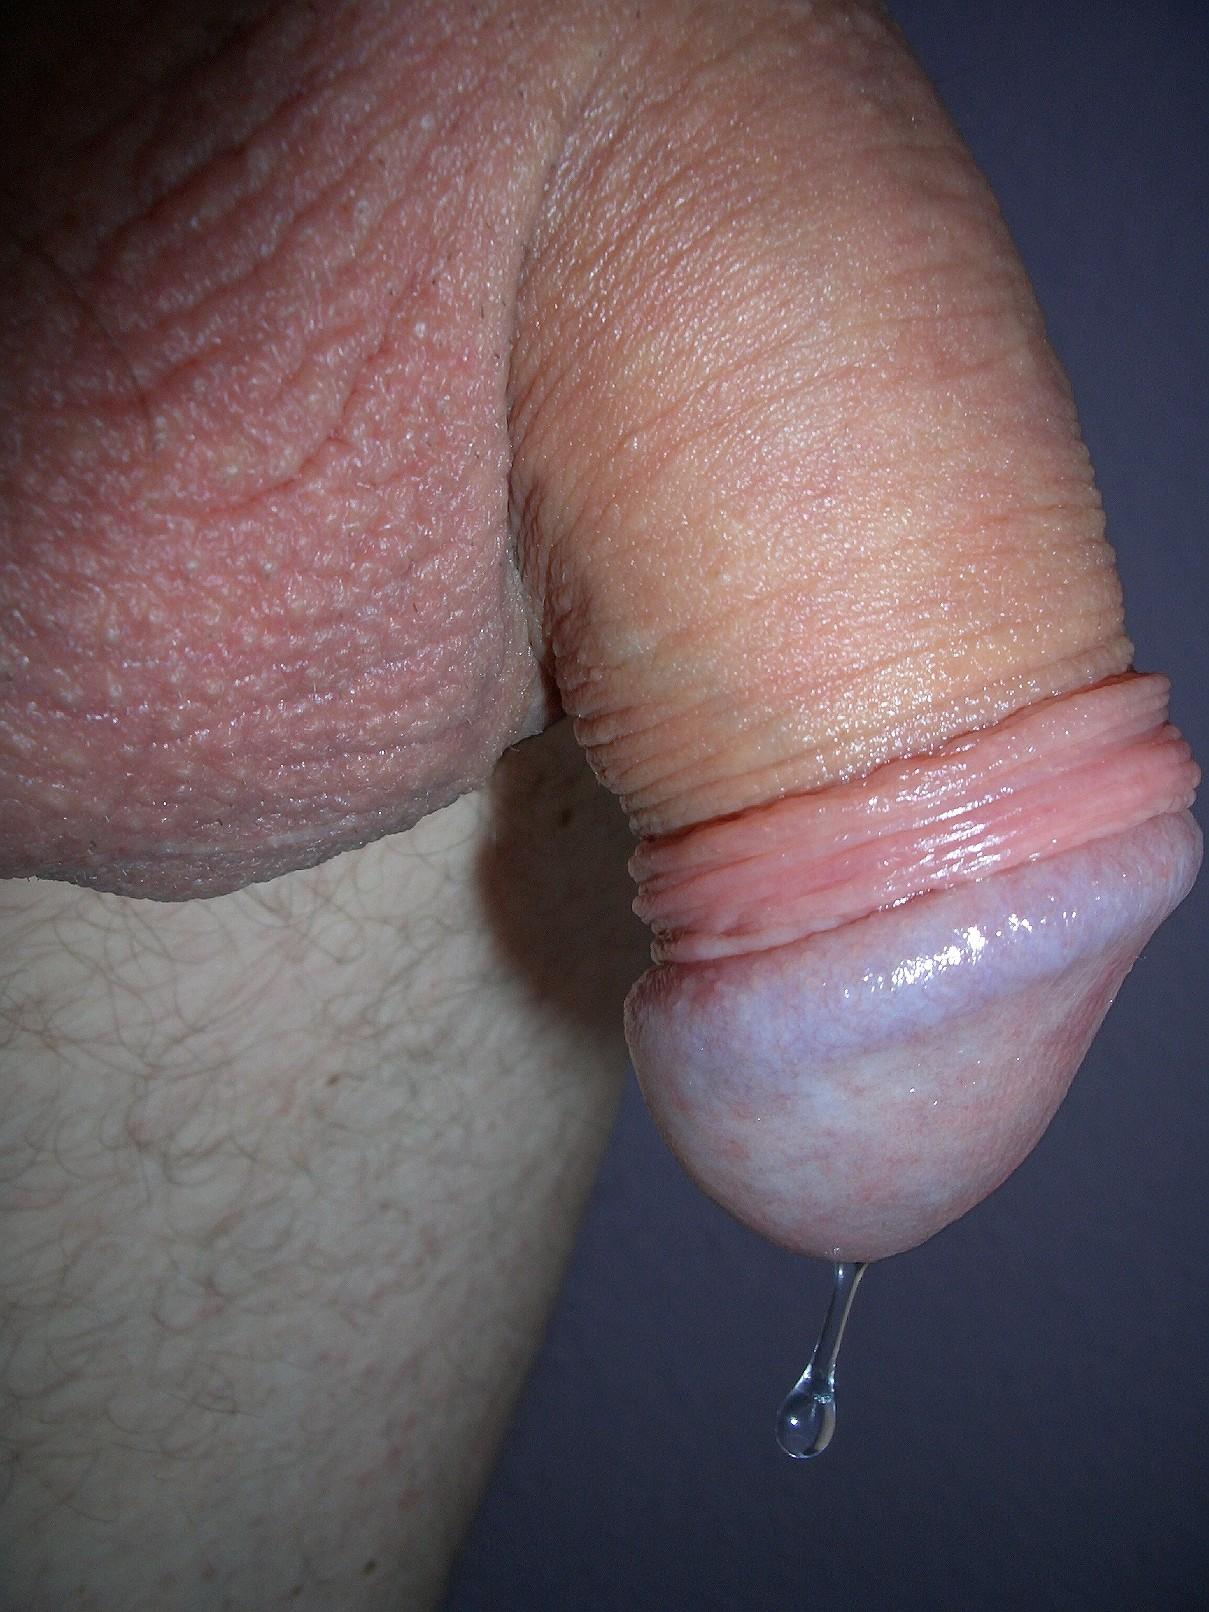 dripping penis pics